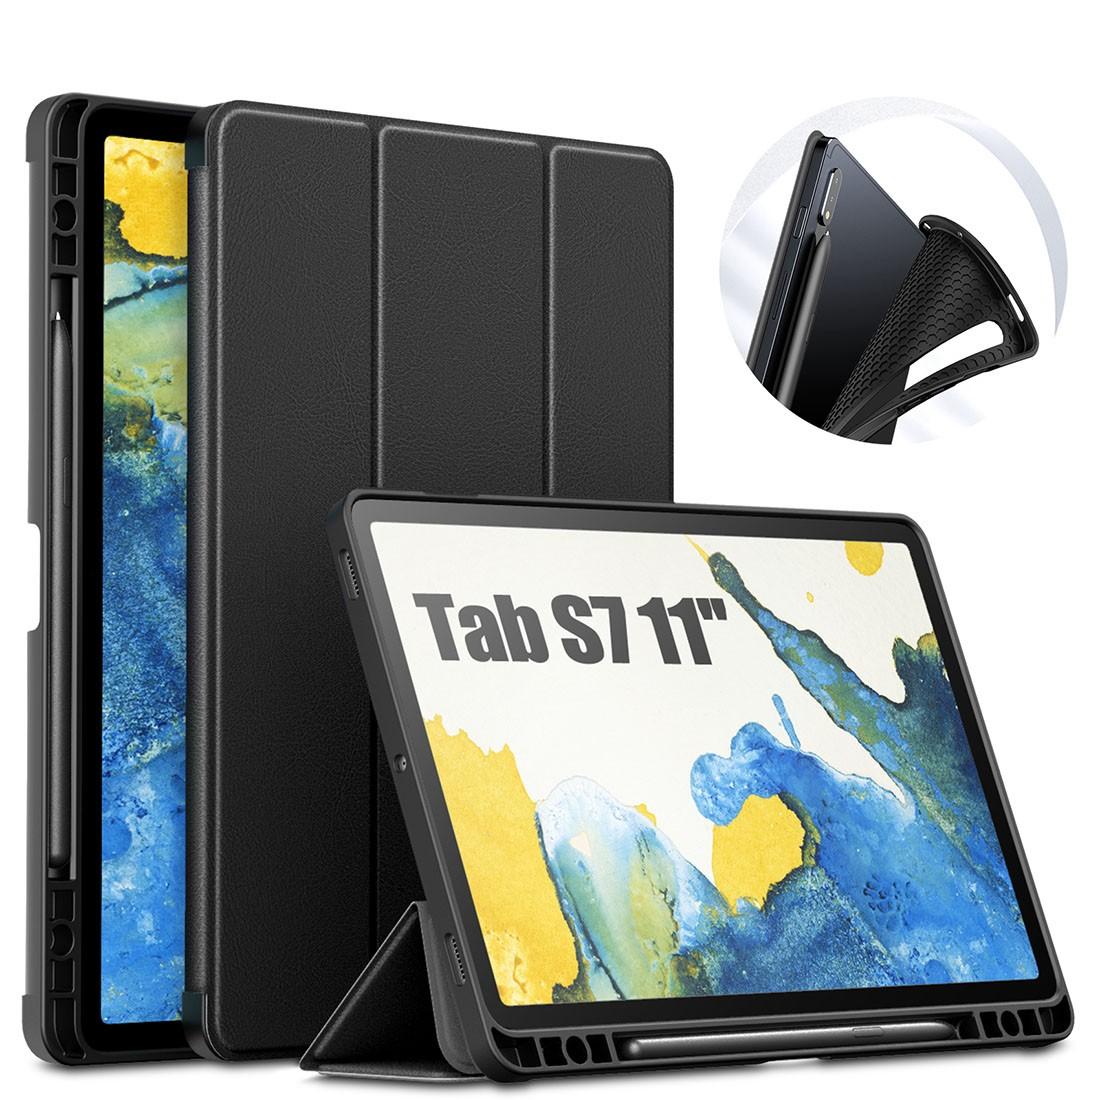 Capa Premium Anti Impacto Fino Acabamento Galaxy Tab S7 11 pol 2020 SM-T870 e SM-T875